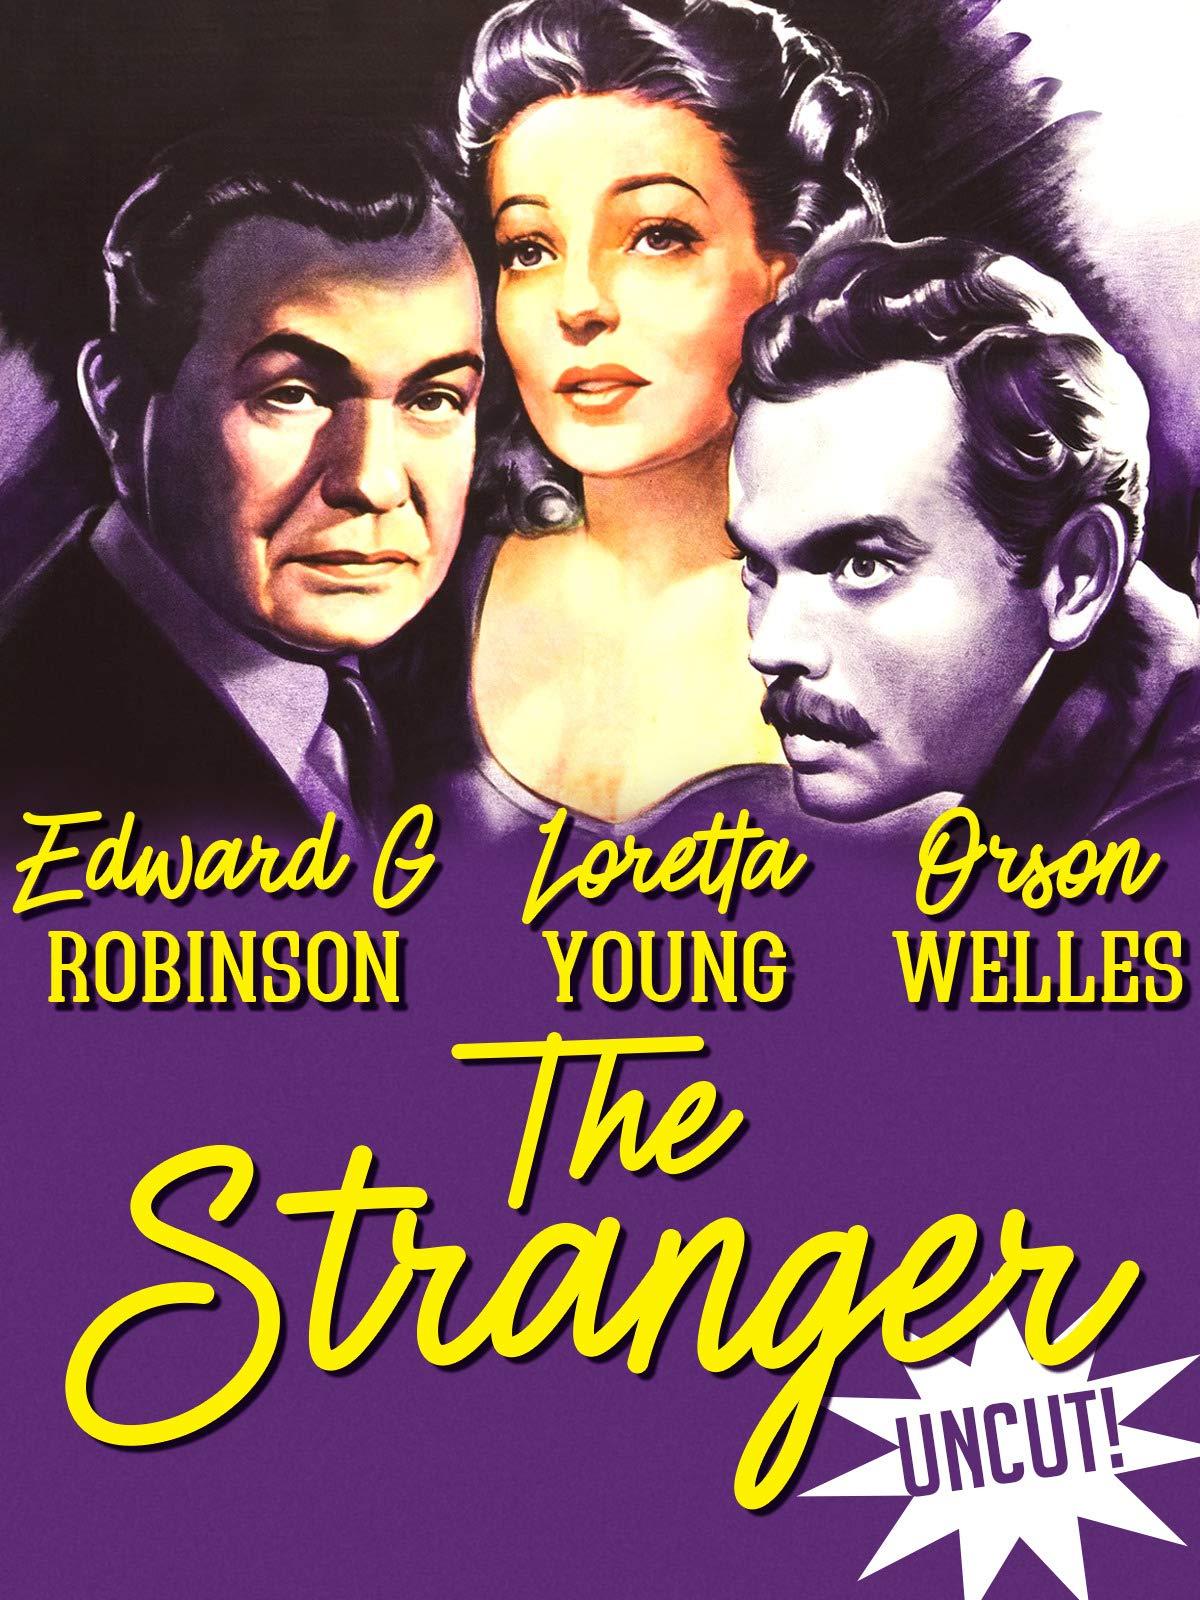 The Stranger - Edward G. Robinson, Loretta Young, Orson Welles, Uncut!